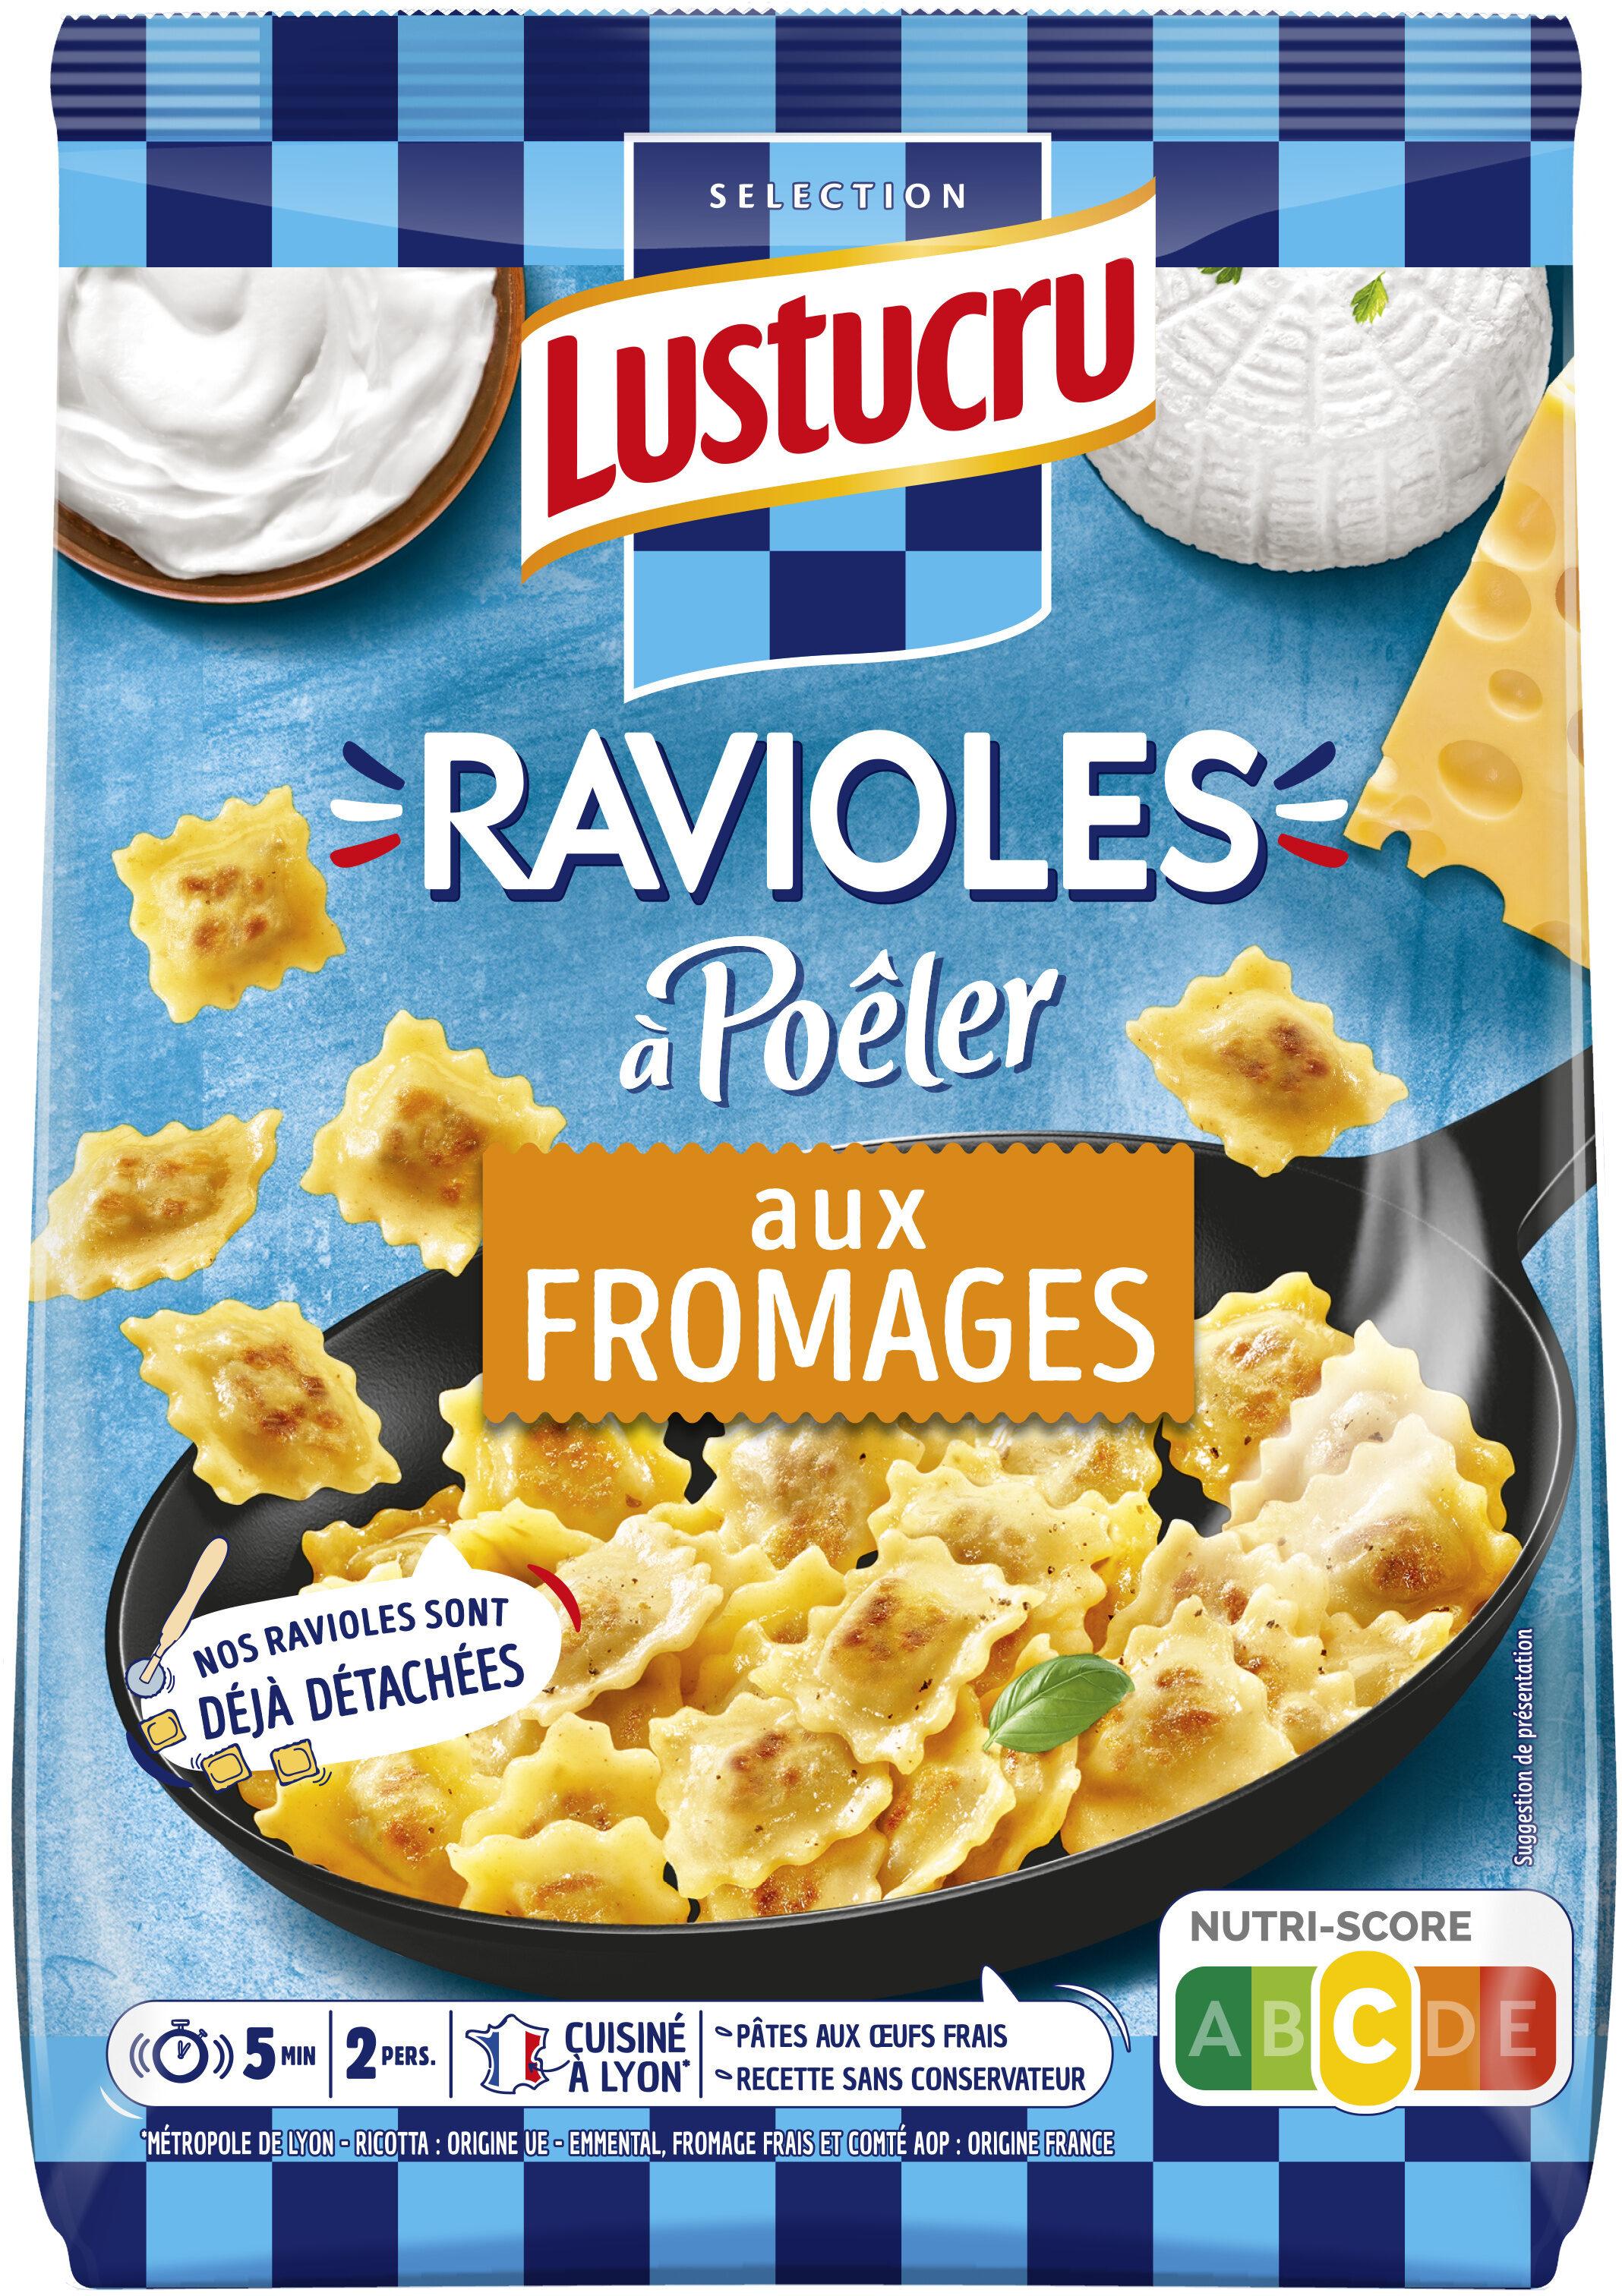 Lustucru ravioles a poeler fromages selectionnes - Product - fr